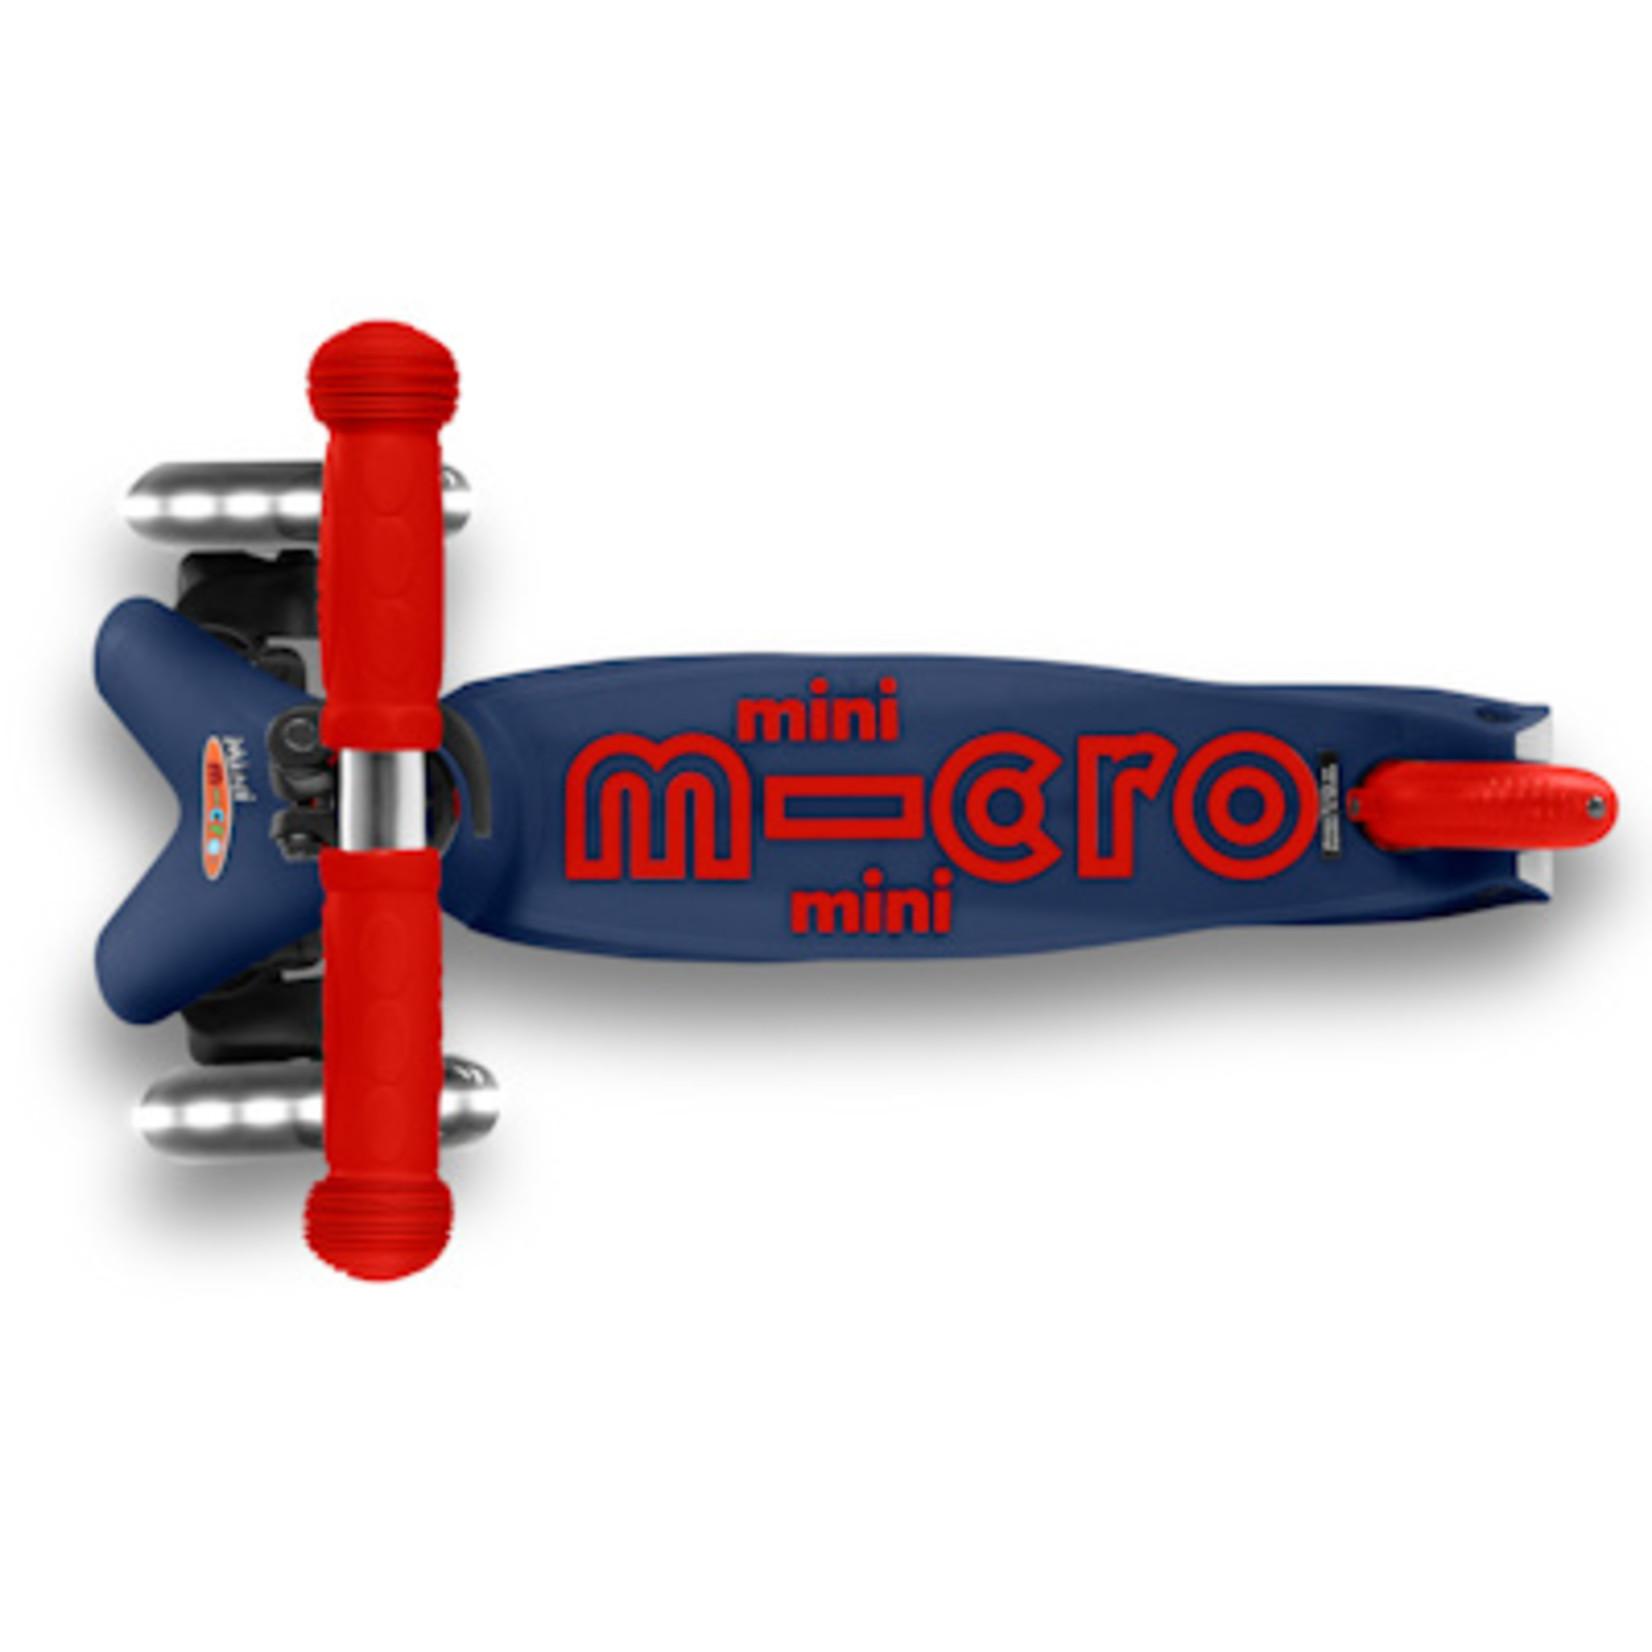 Micro Step Mini Micro step Deluxe marineblauw/rood LED